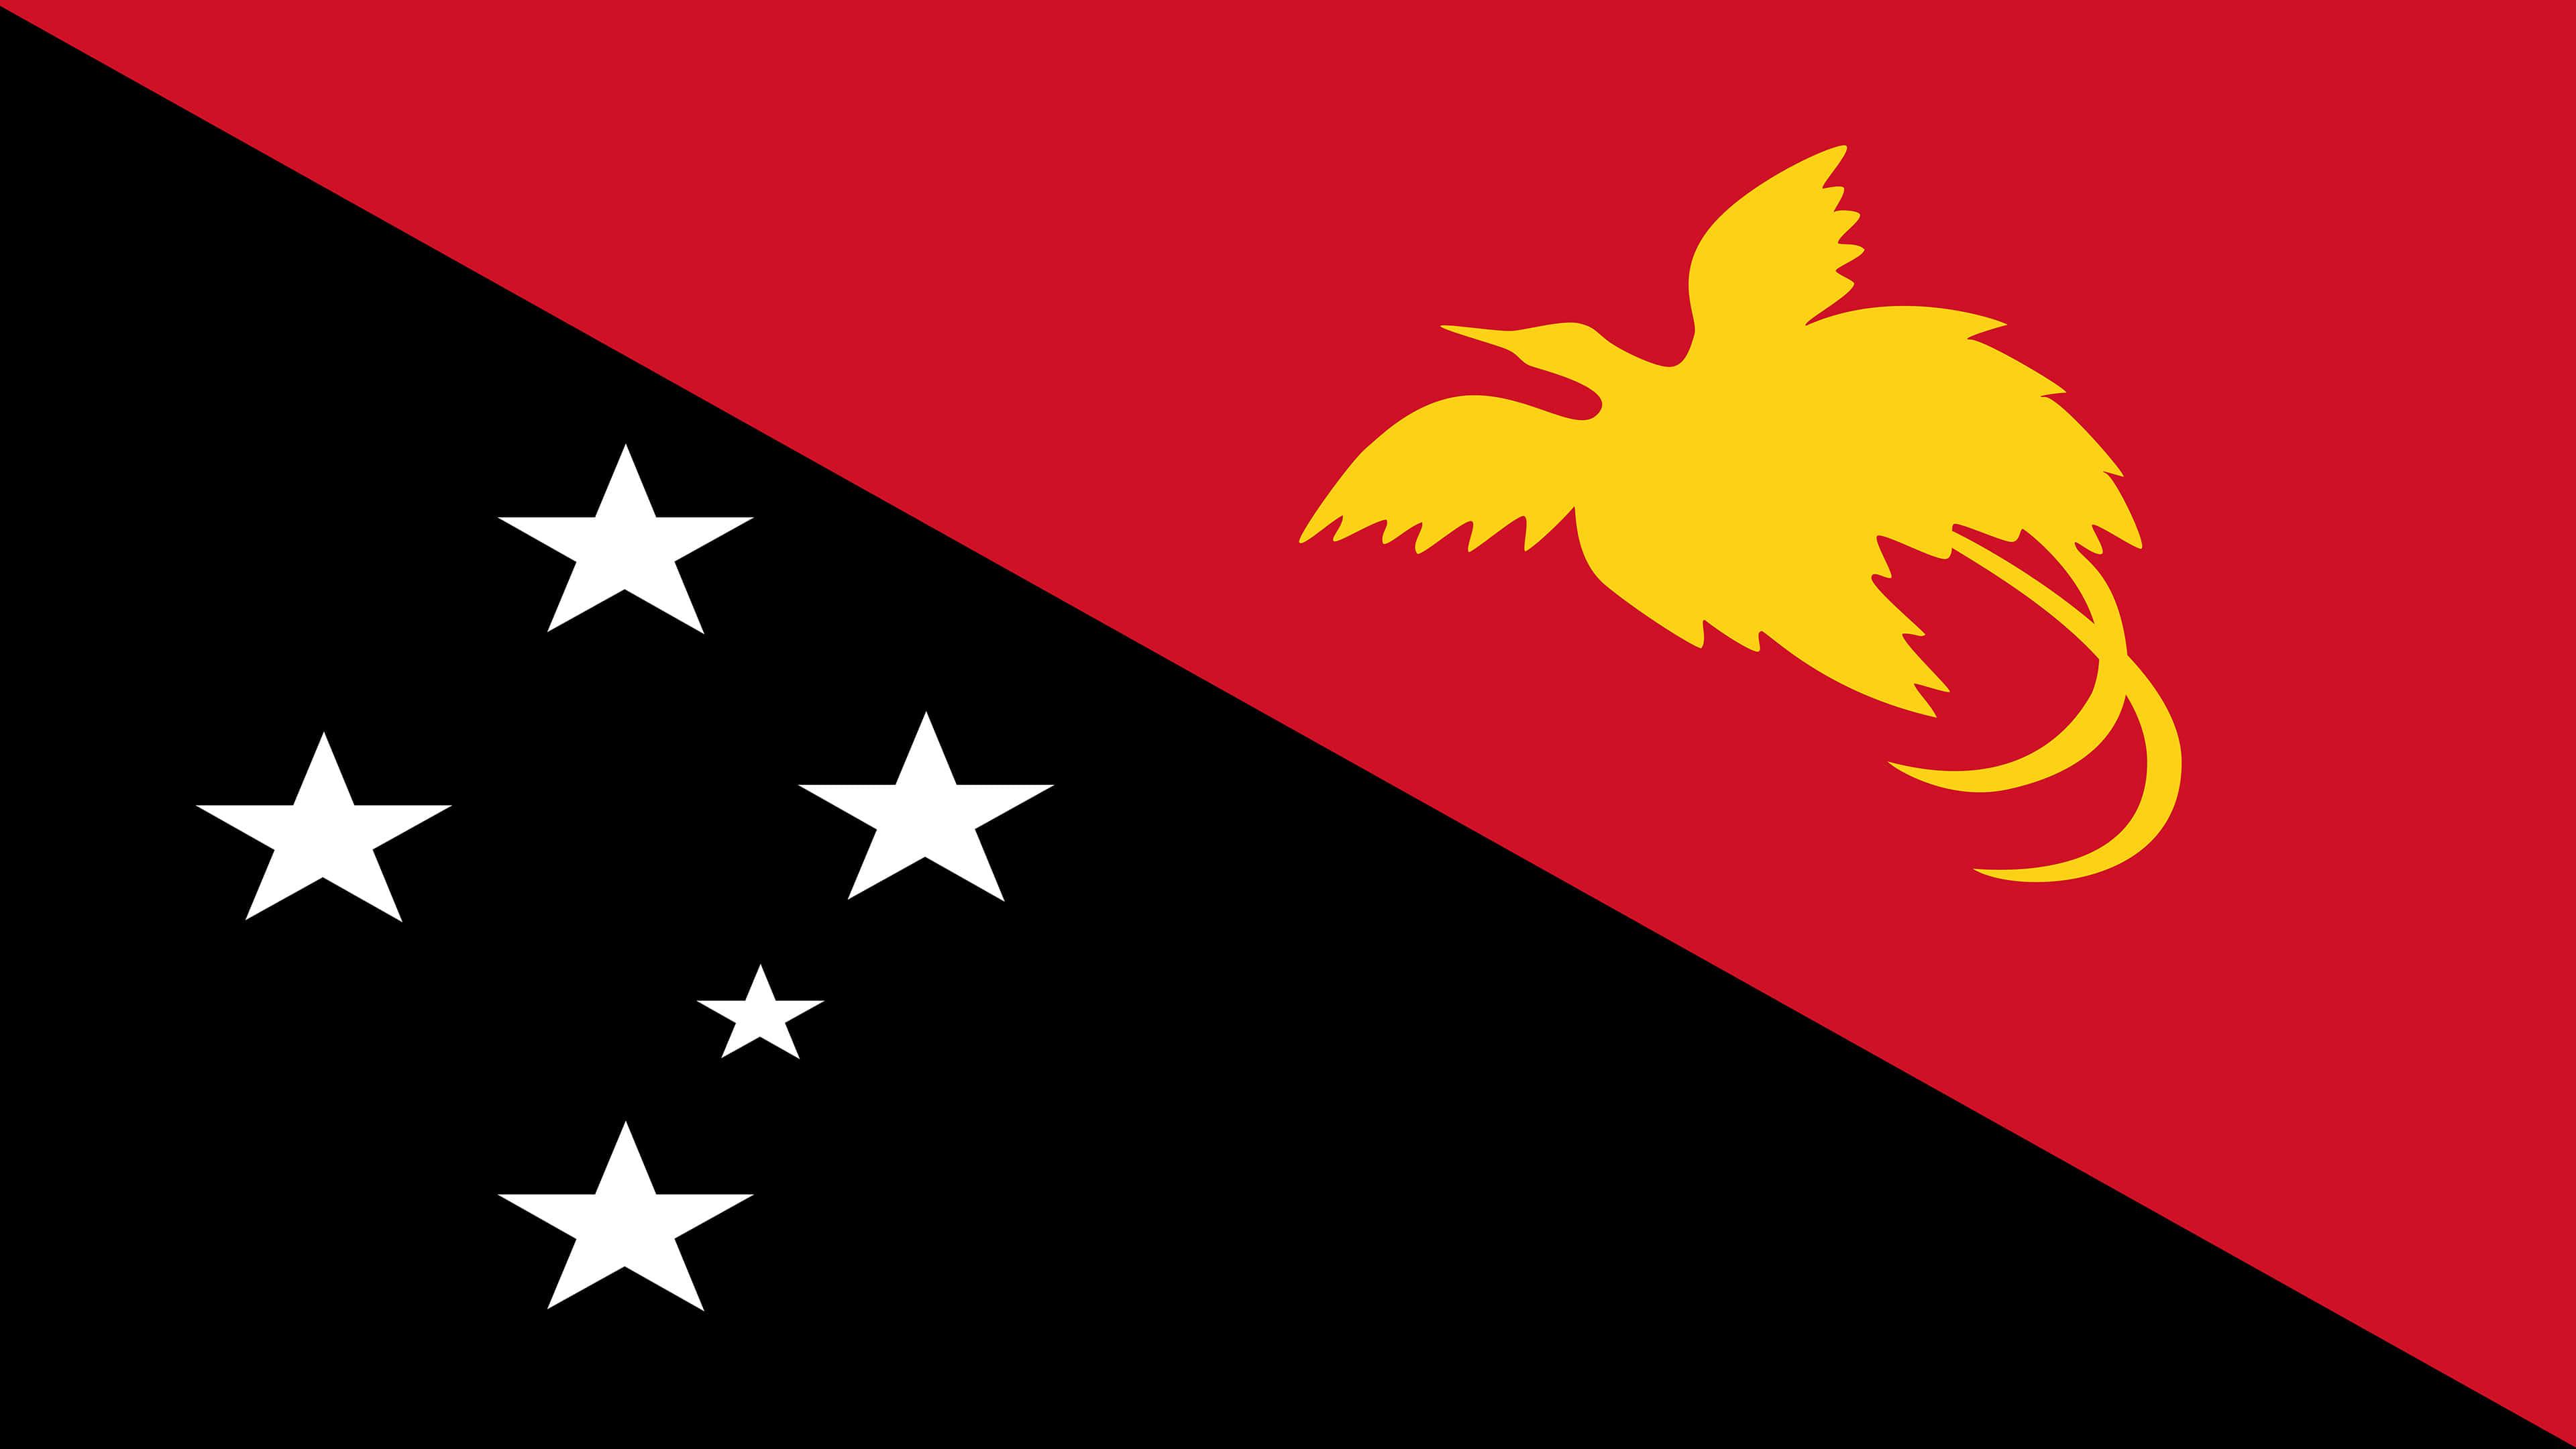 papua new guinea flag uhd 4k wallpaper